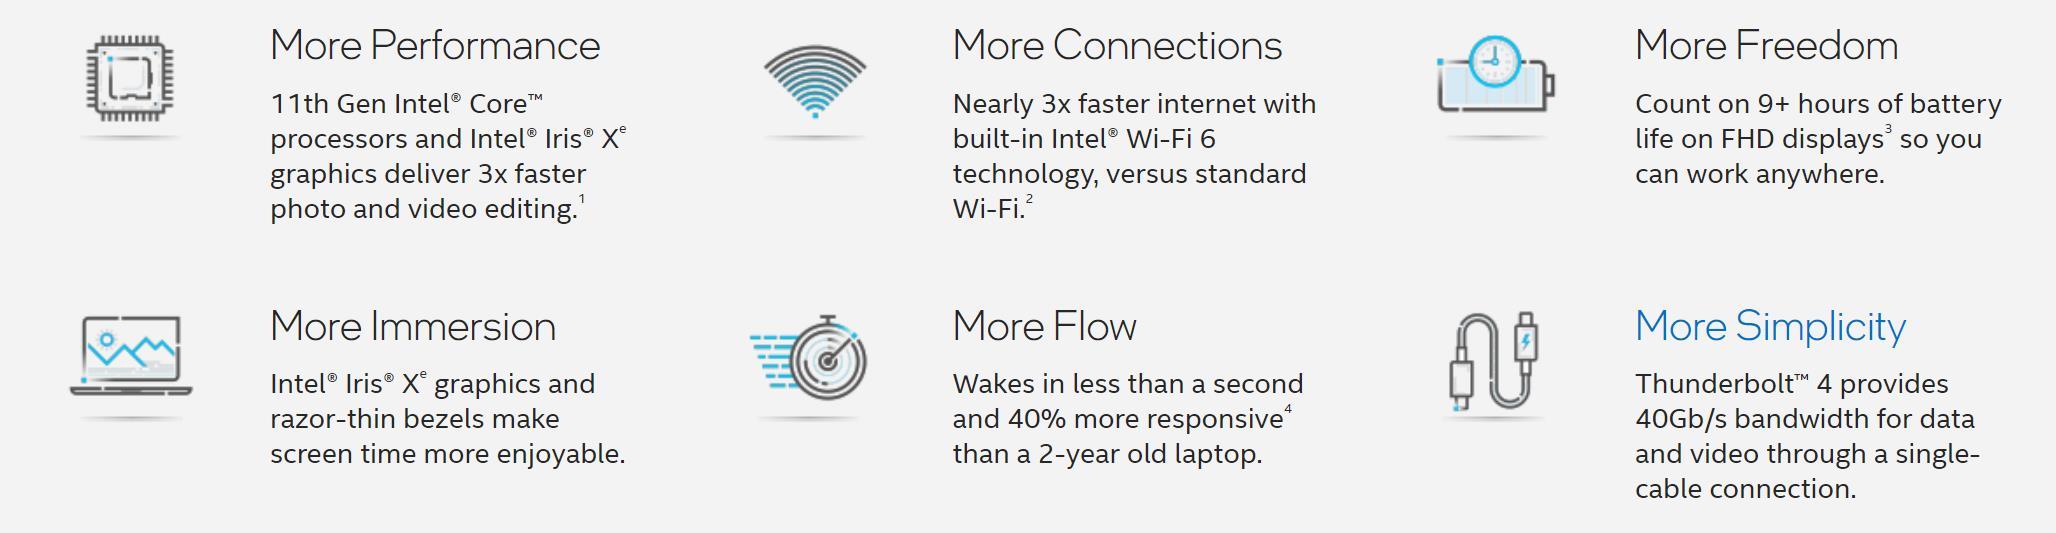 Intel Evo benefits